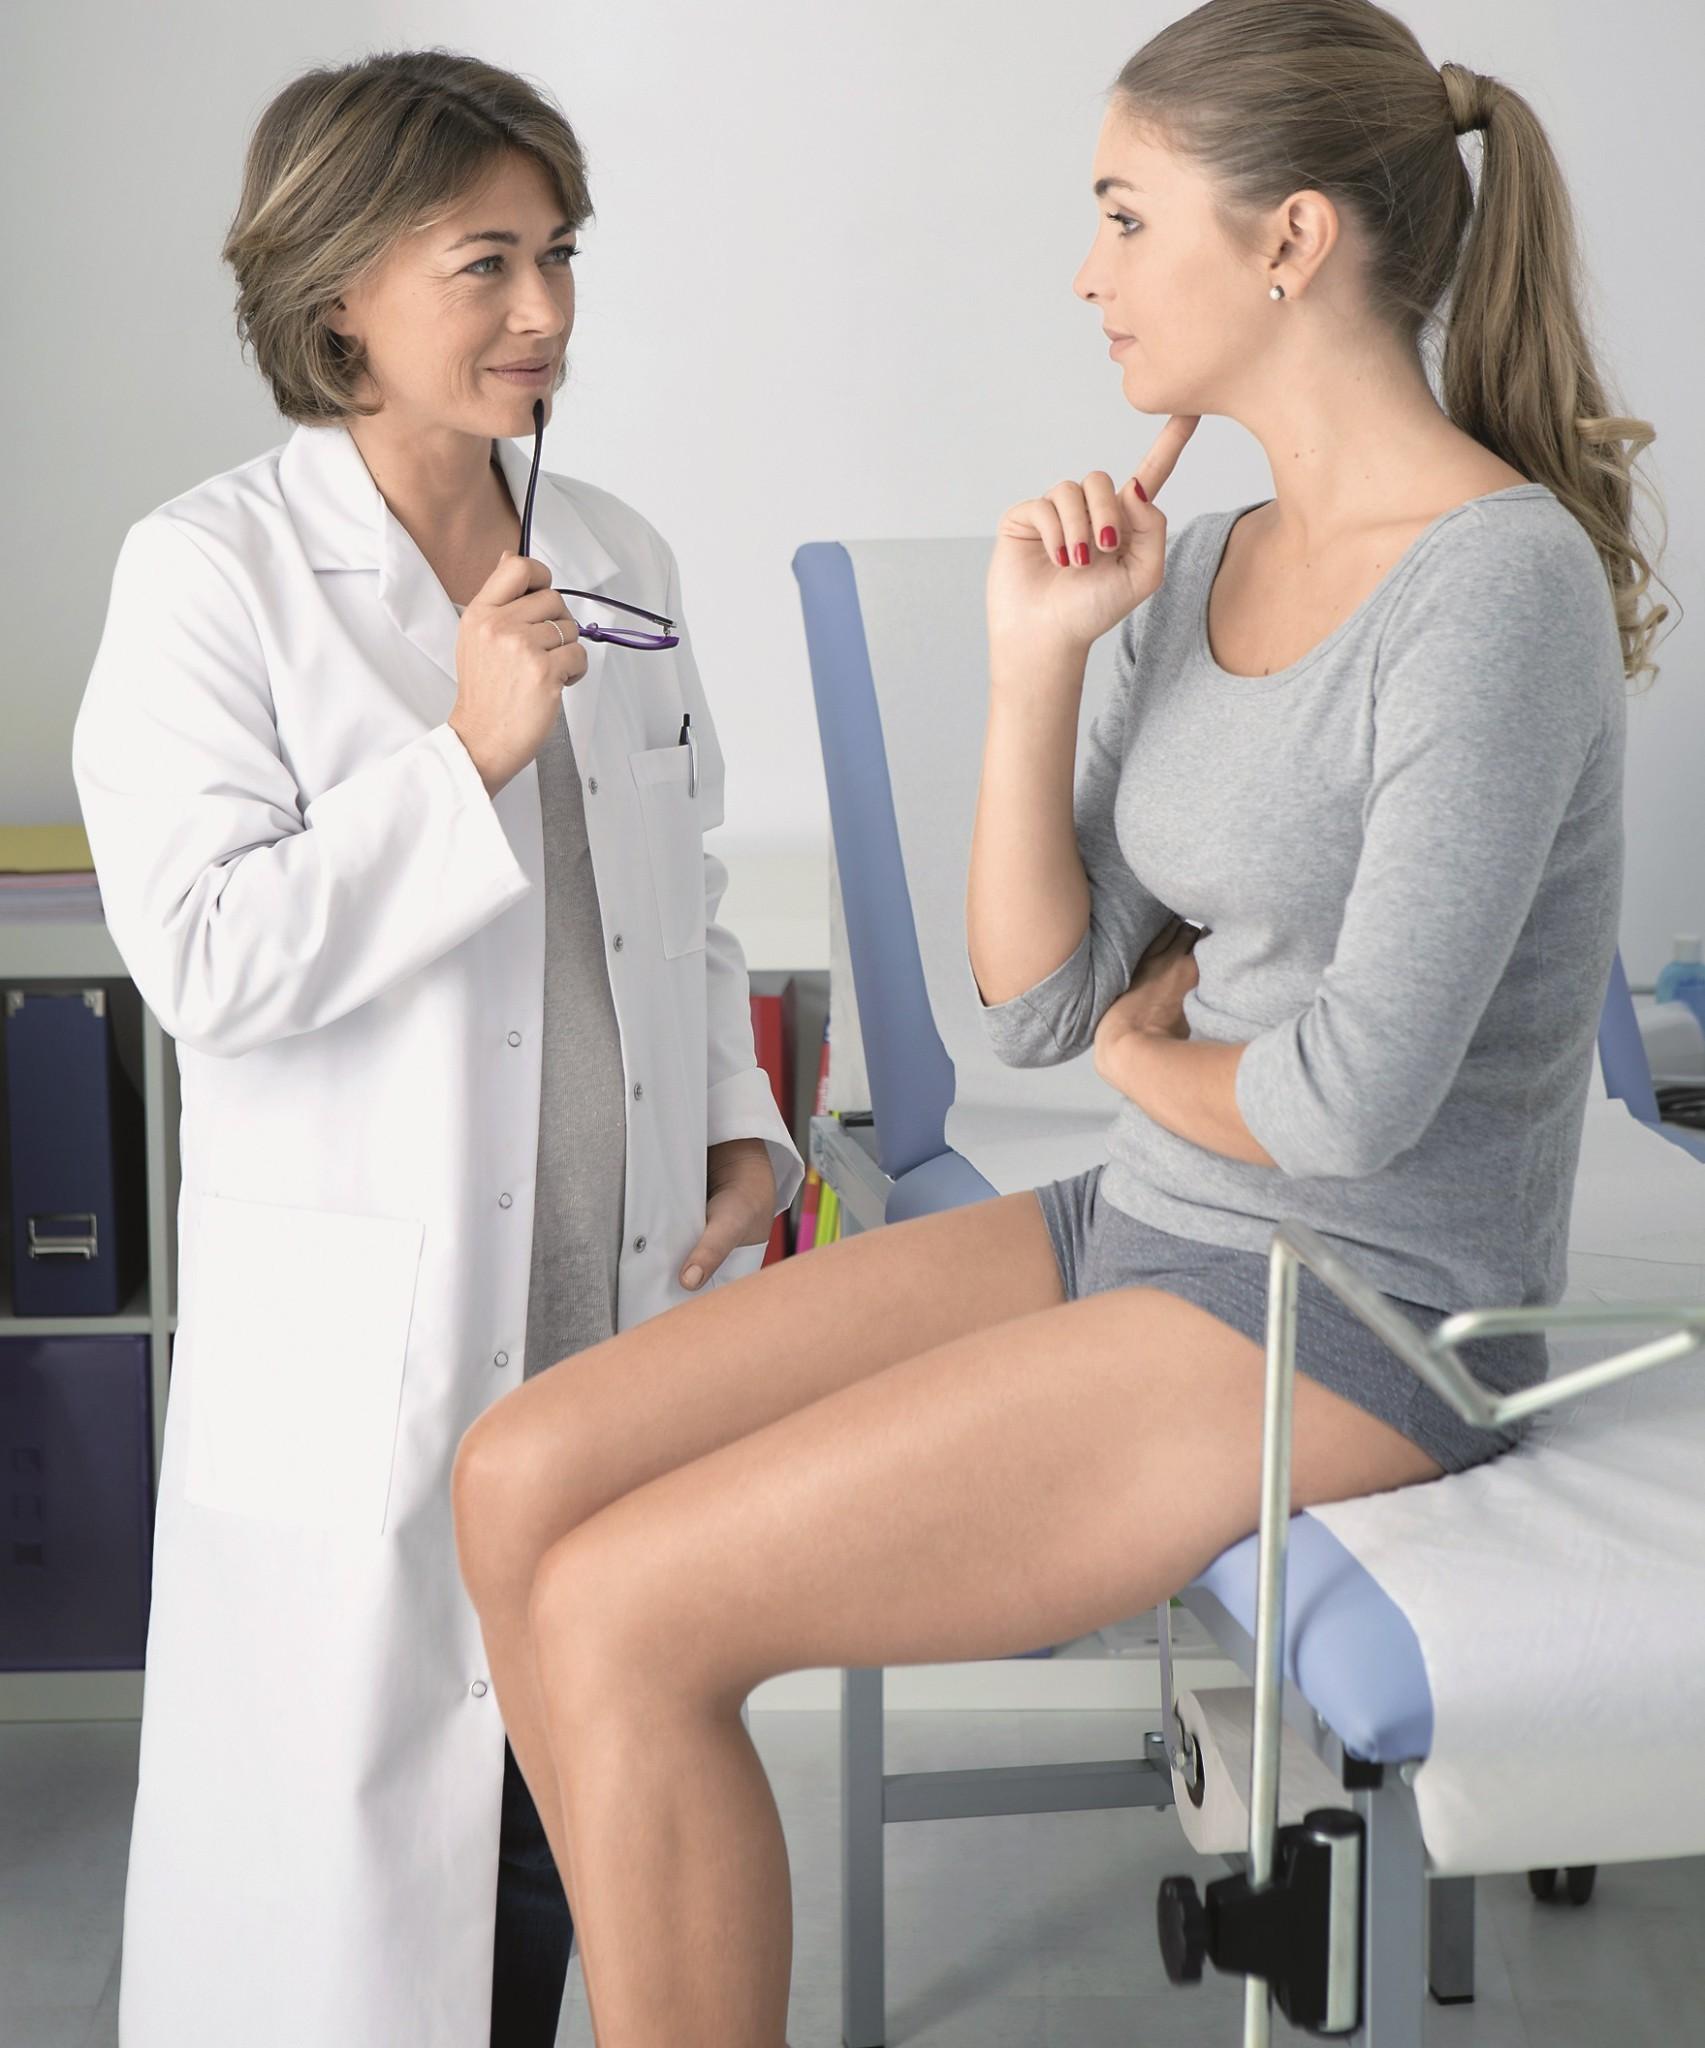 Лишние анализы: рекомендации гинеколога